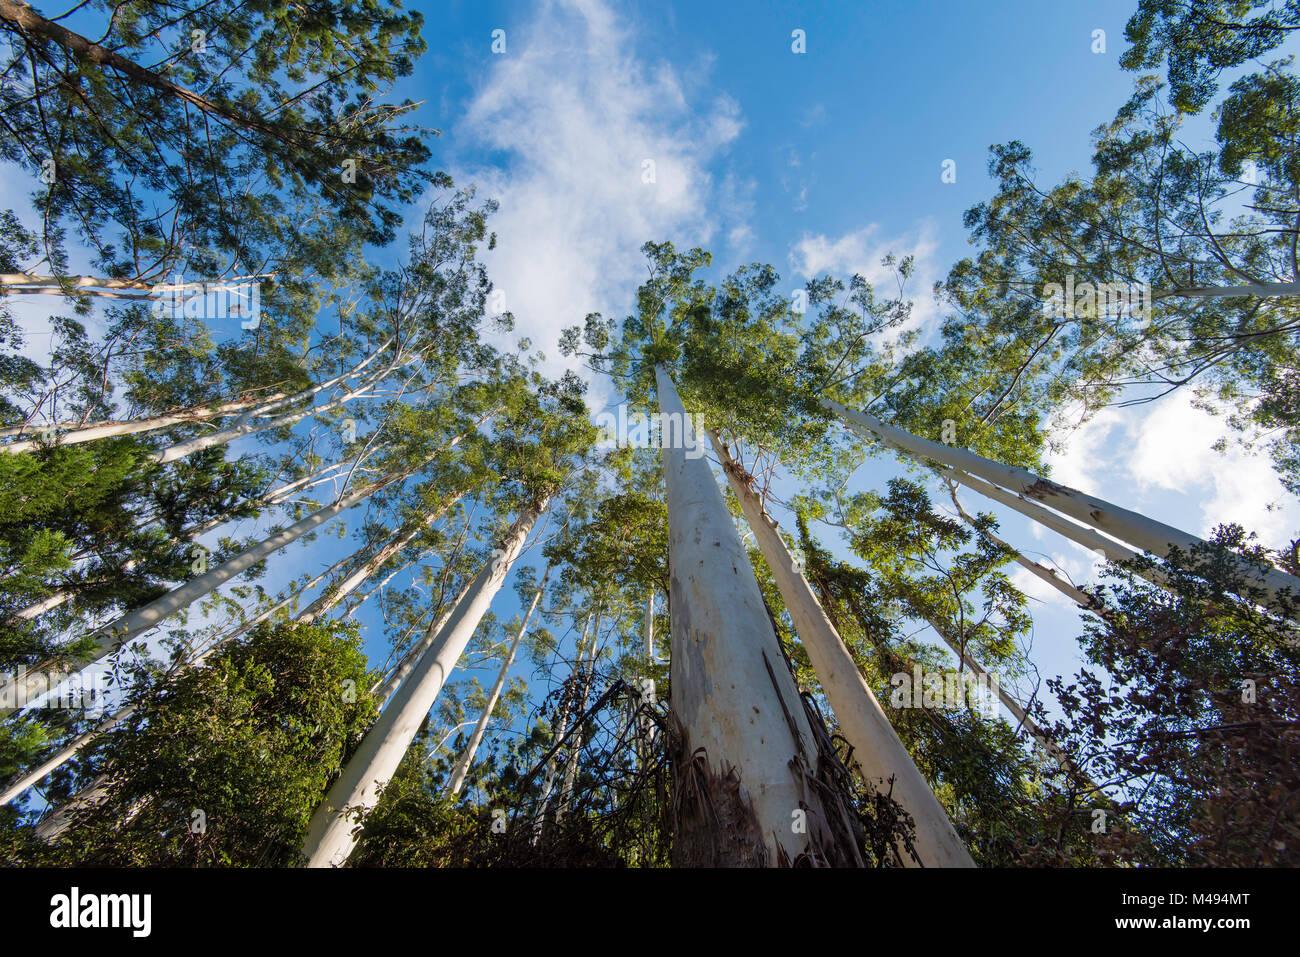 Tall Tree Eucalyptus Stock Photos & Tall Tree Eucalyptus